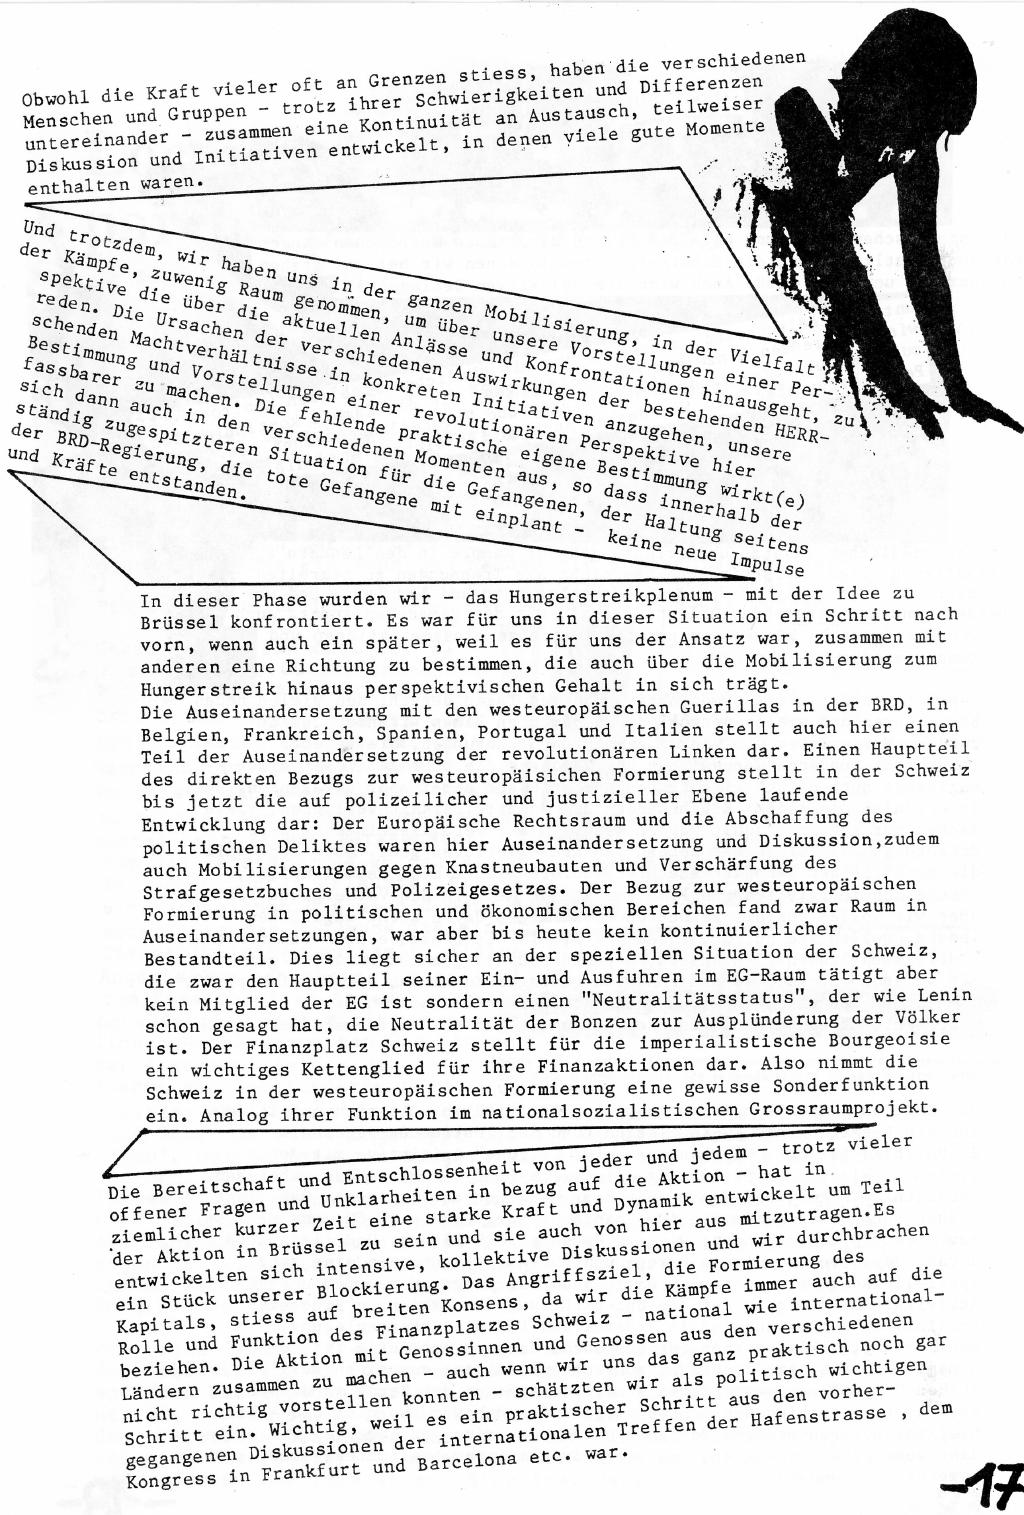 Belgien_Doku_Besetzung_EG_Kommission_1989_019